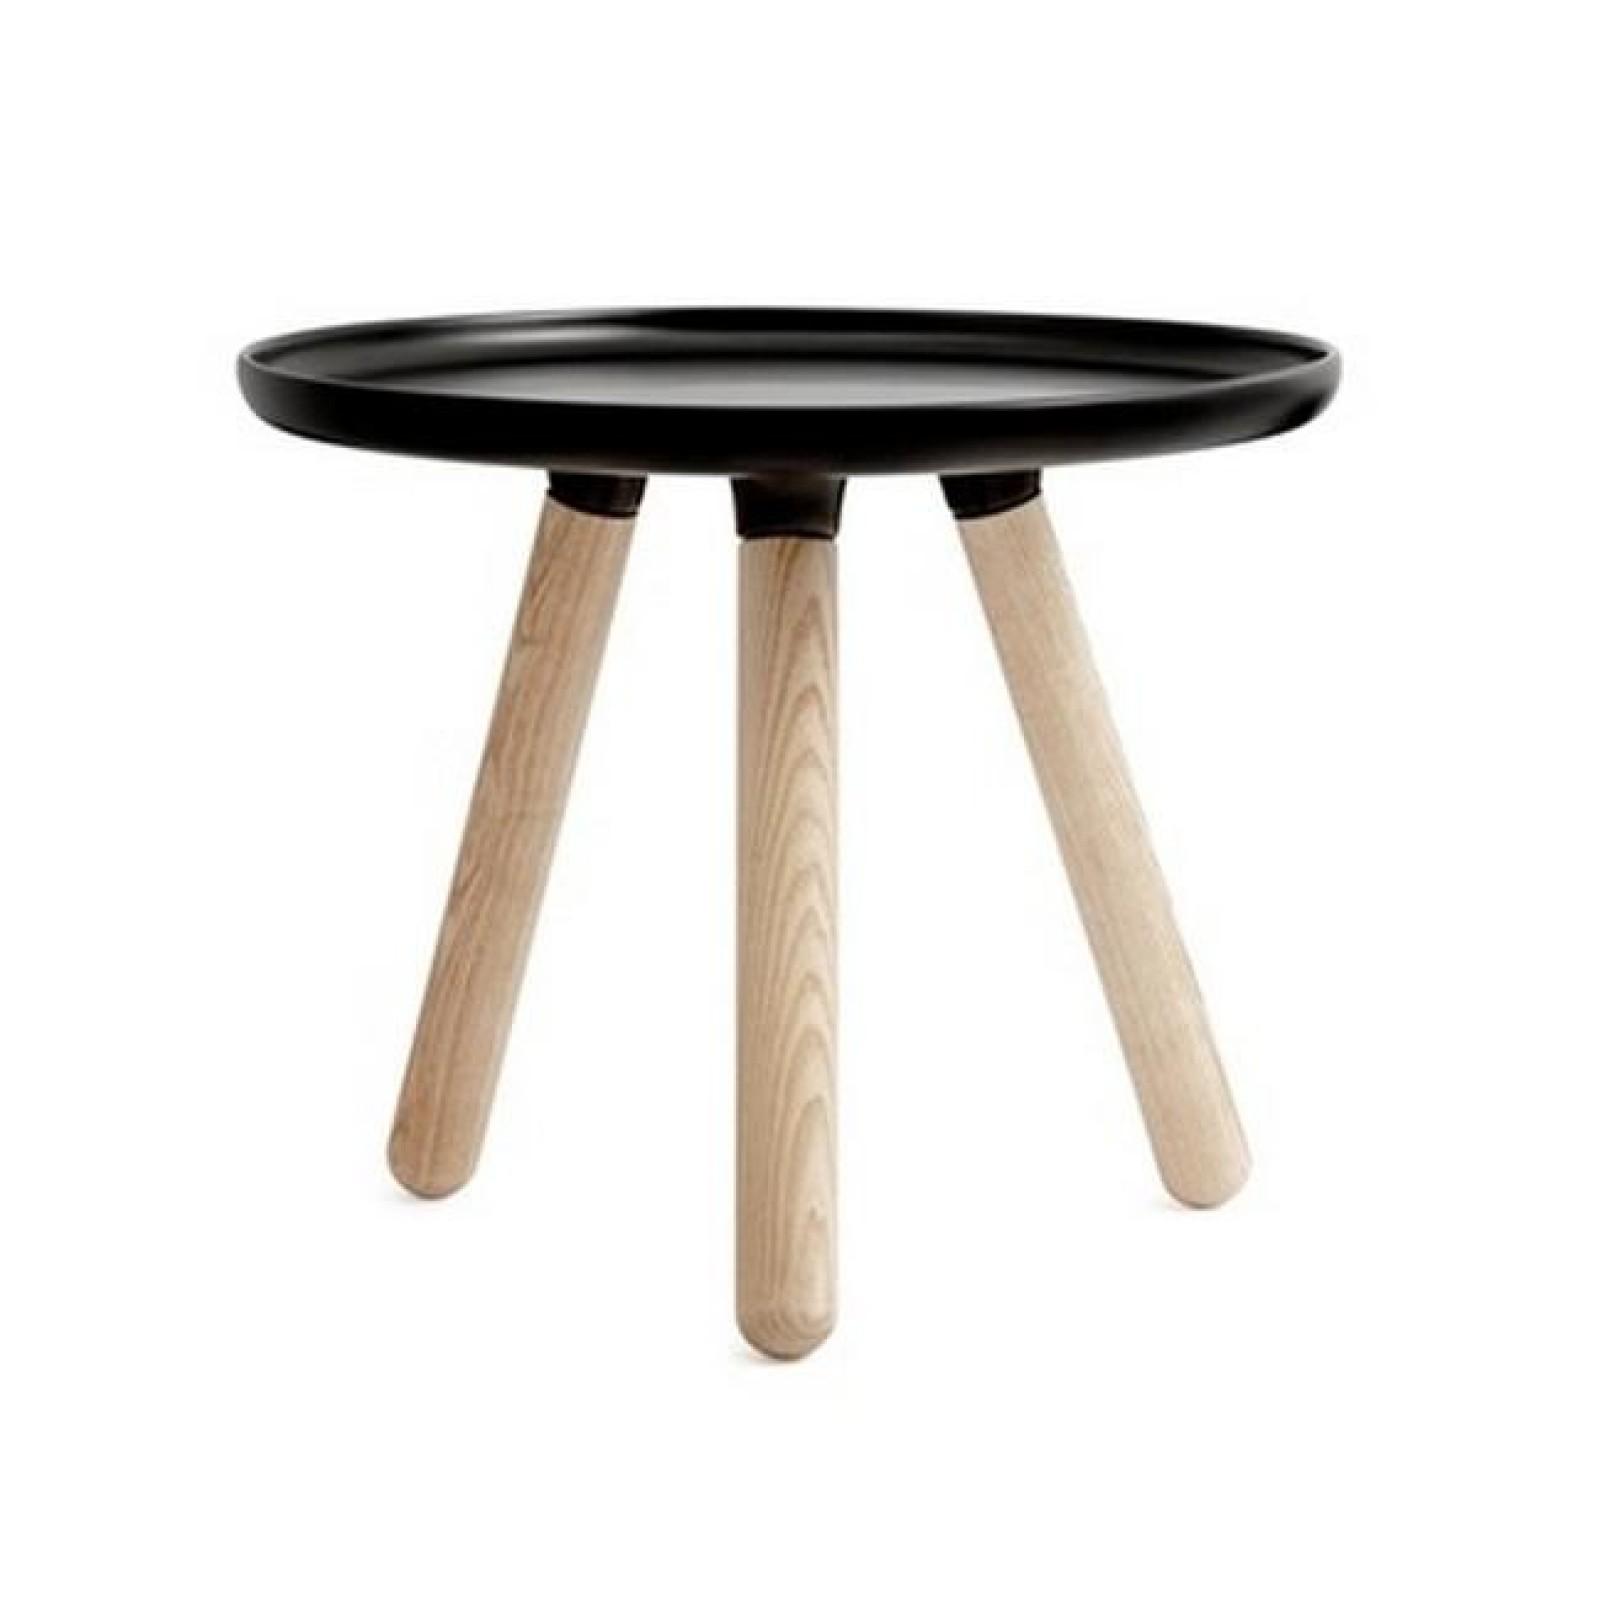 Tablo Small Table - Normann Copenhagen